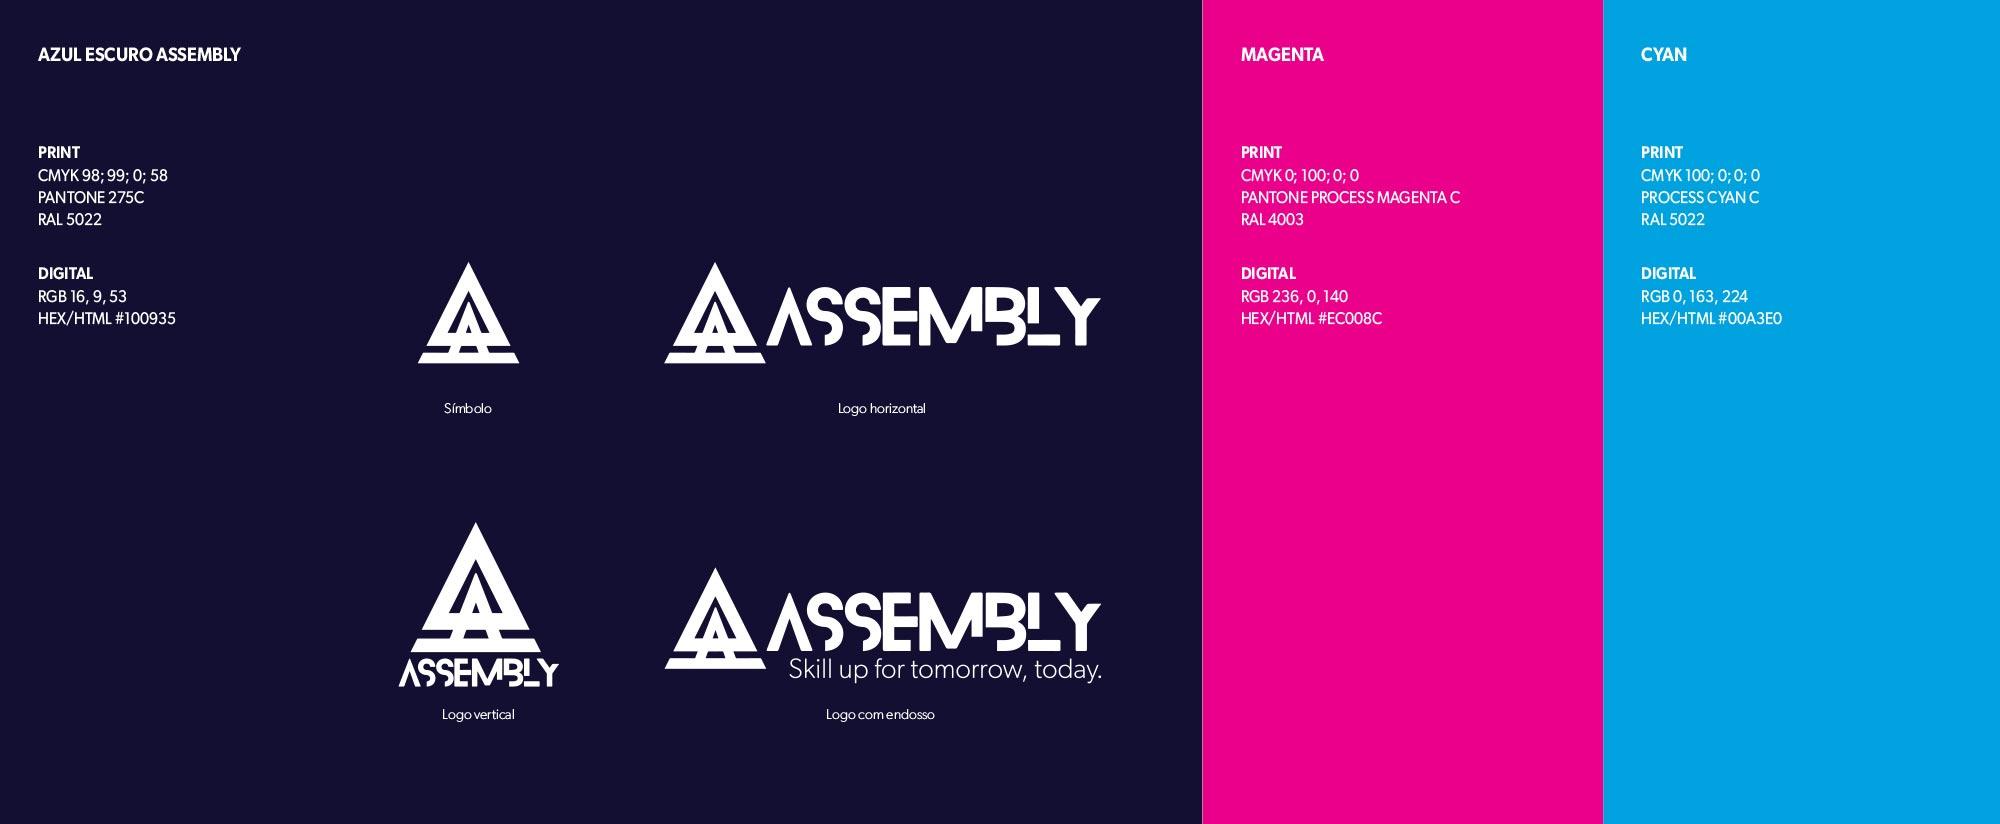 galeria1 assembly activemedia